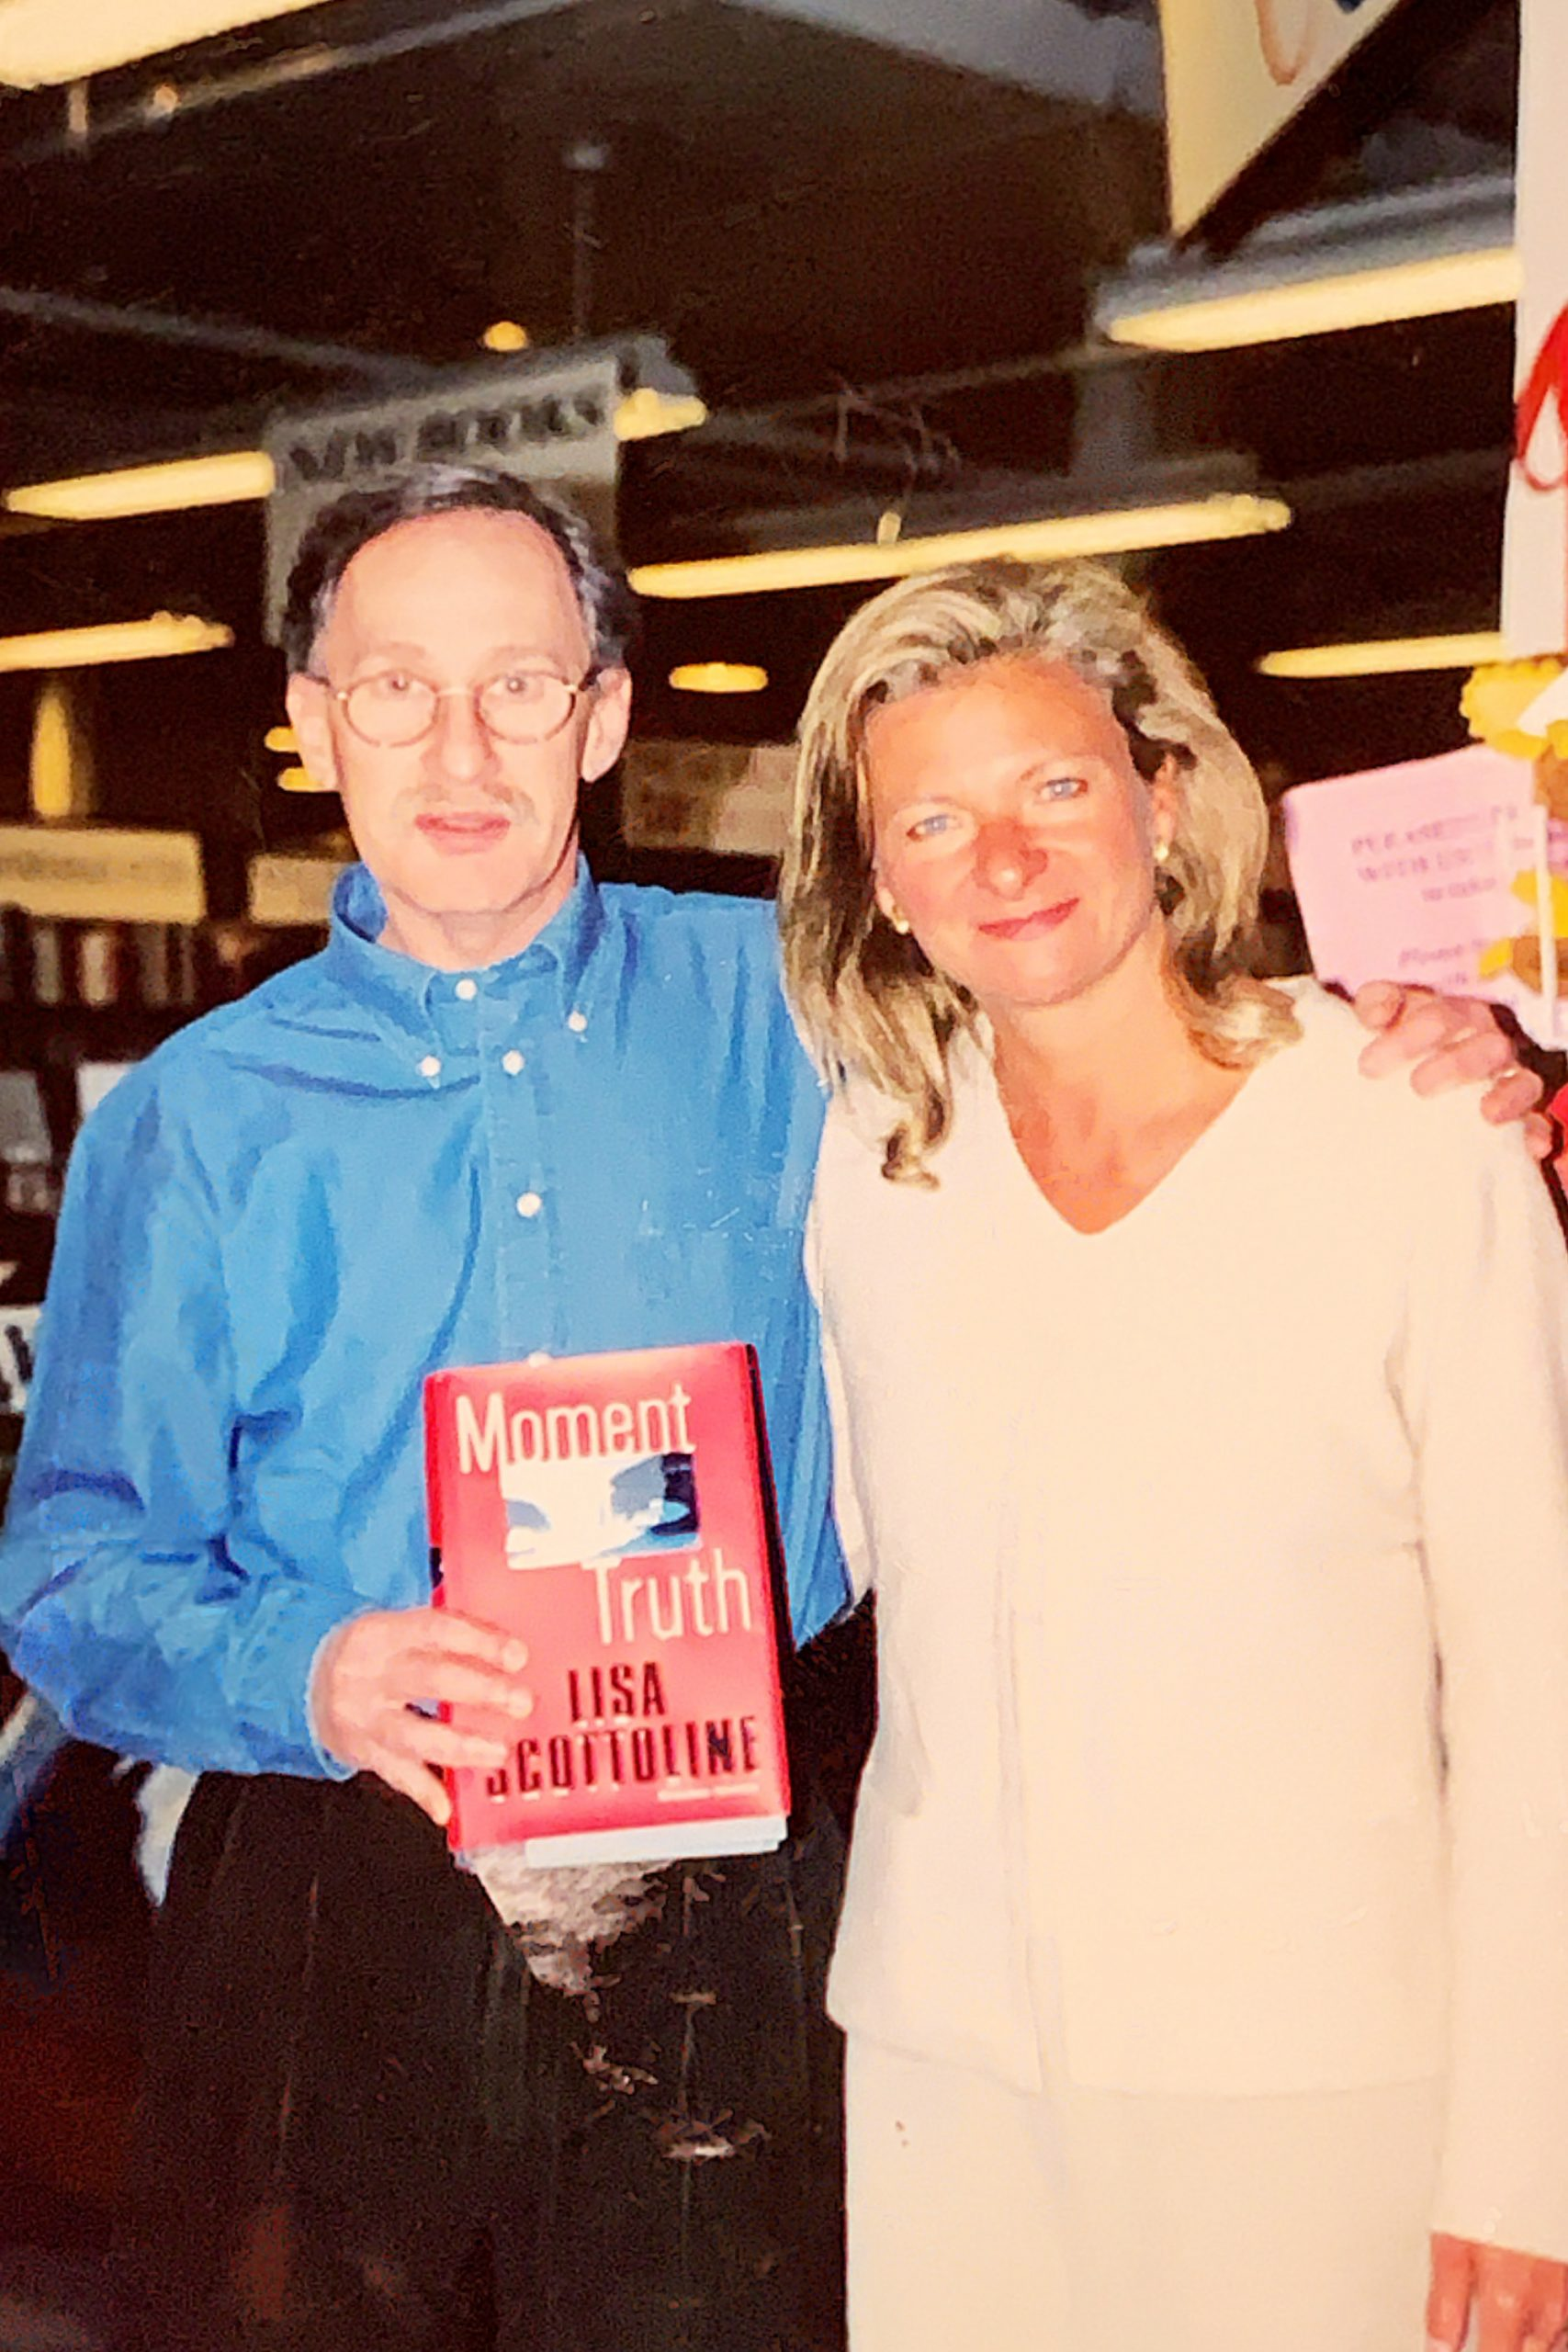 Lisa Scottoline with Larry Davidson